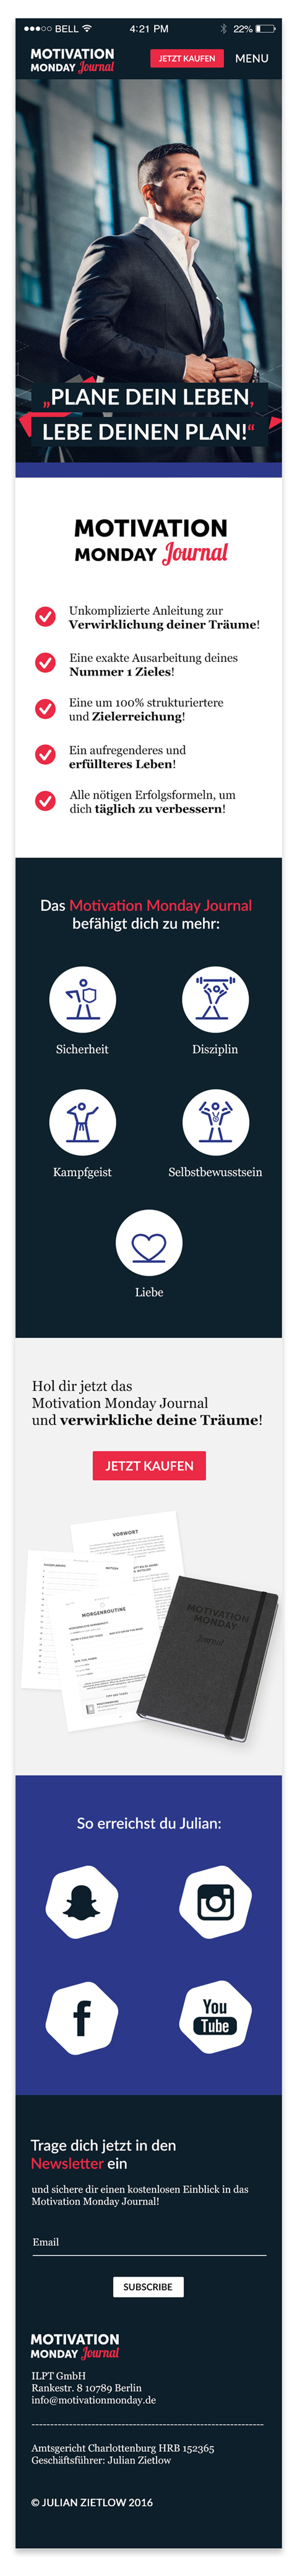 MMJ_WEBSITE_mobile+